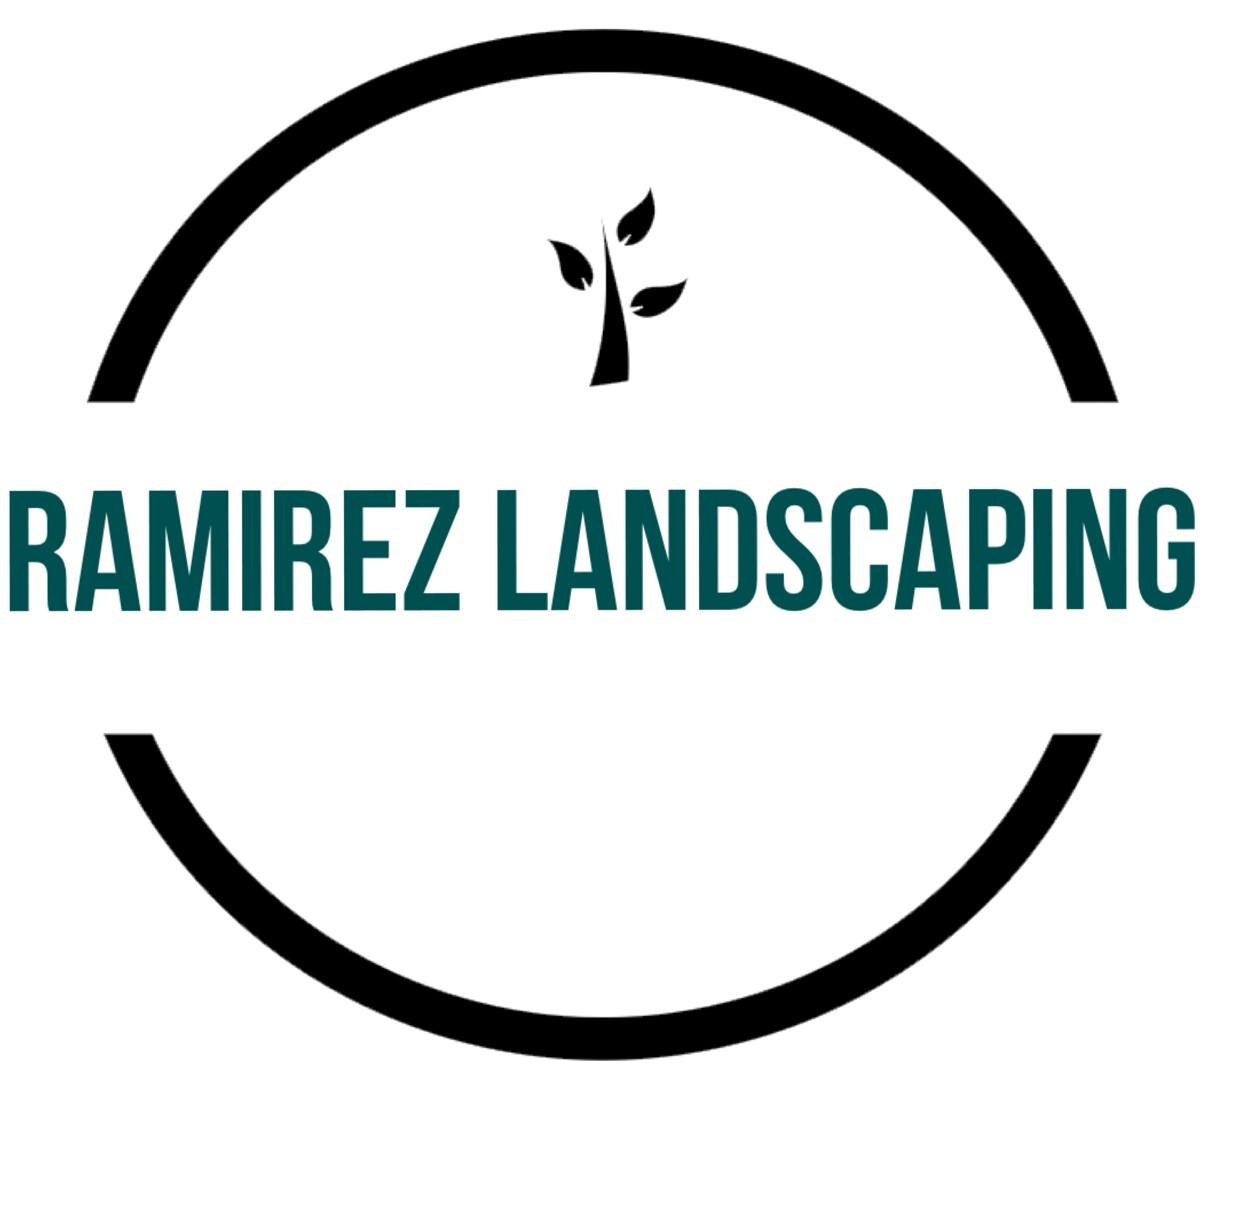 Ramirez Landscaping